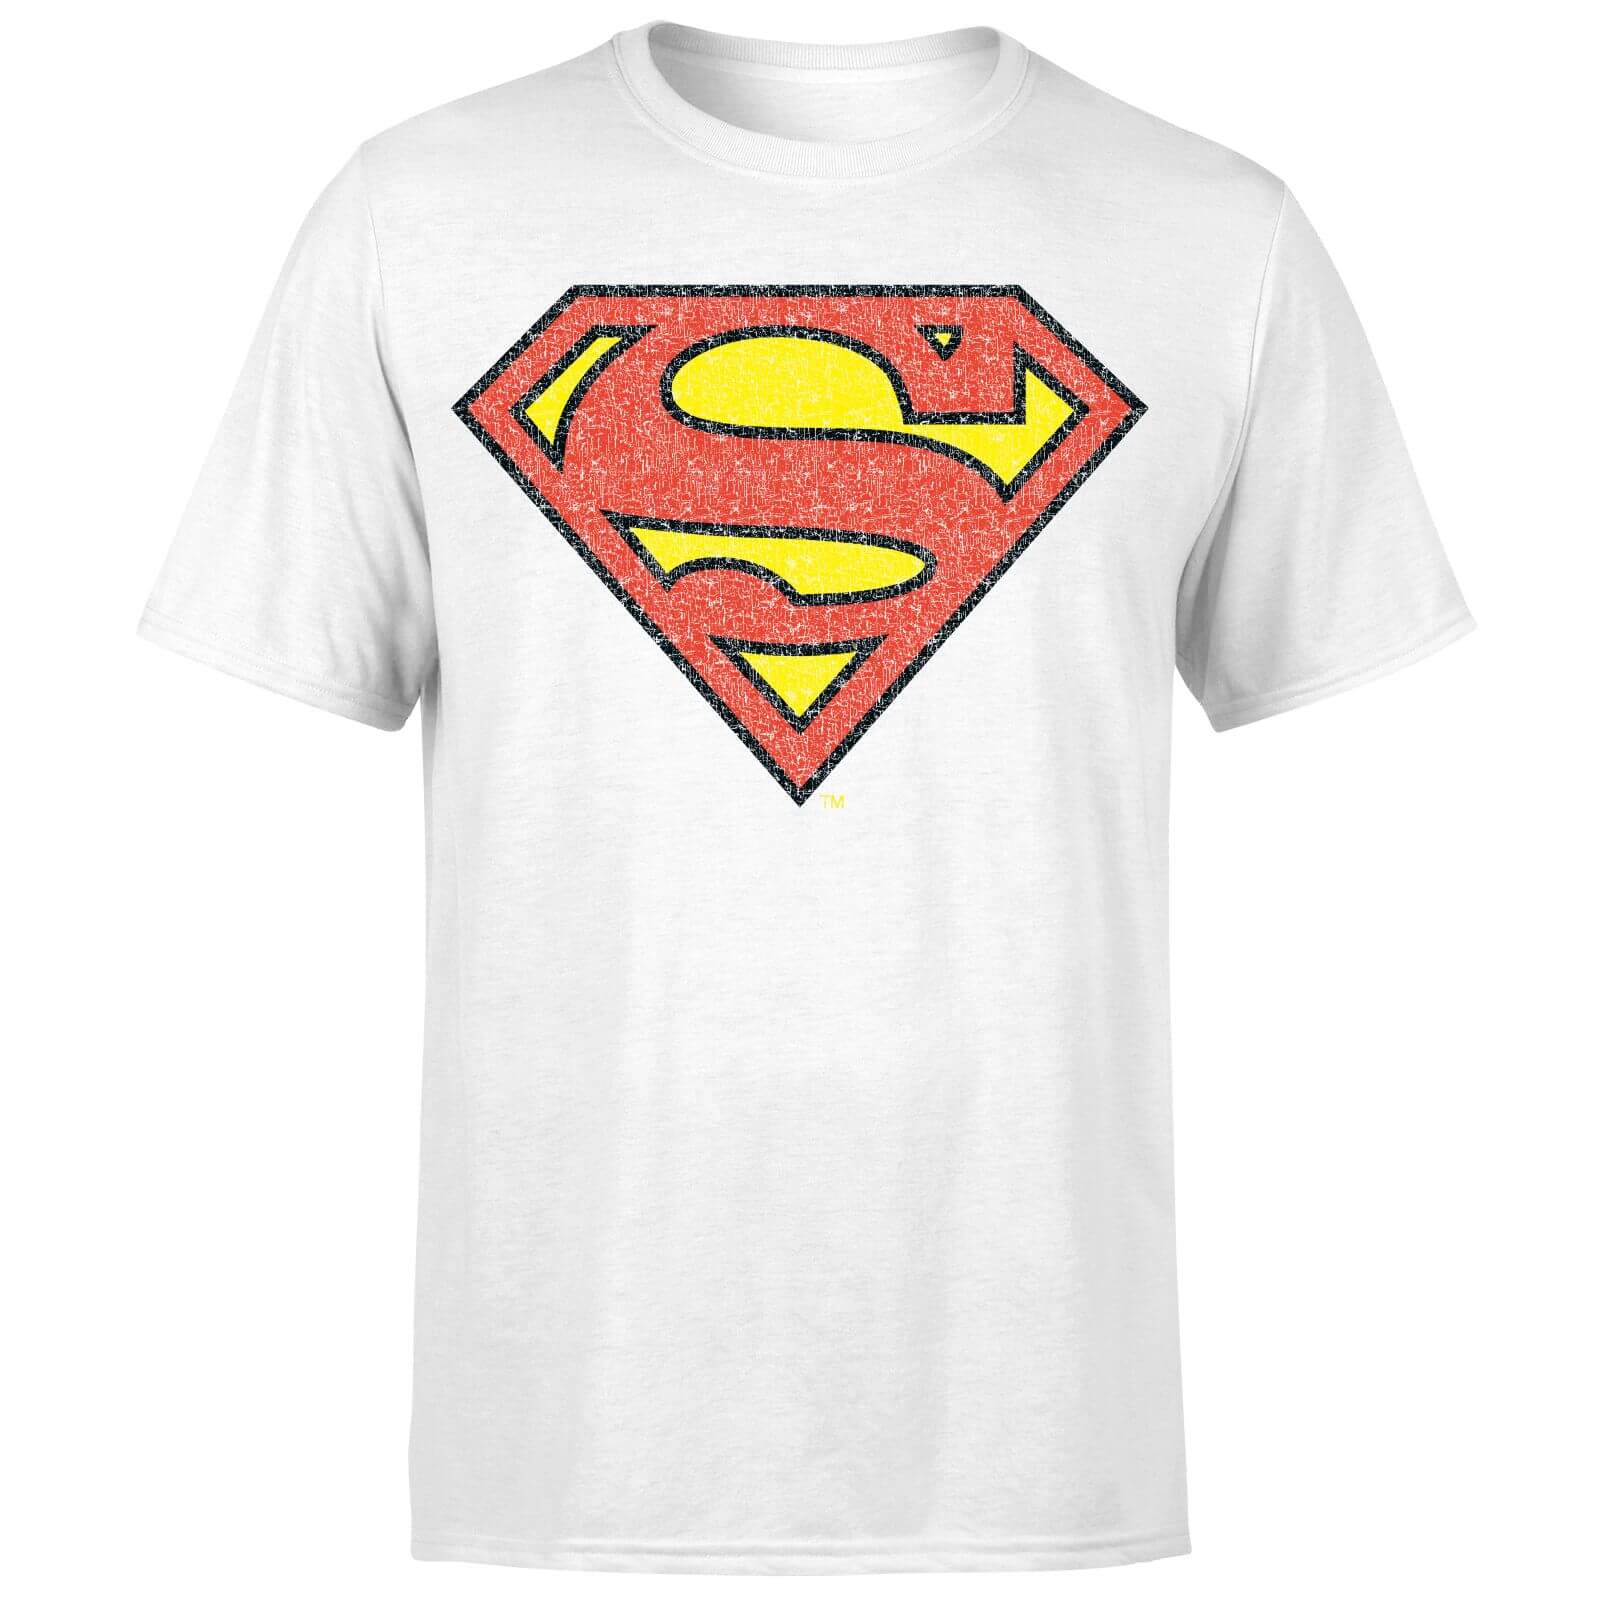 ec677caf92 Camiseta DC Comics Superman Logo Craquelado - Hombre - Blanco Clothing    Zavvi España